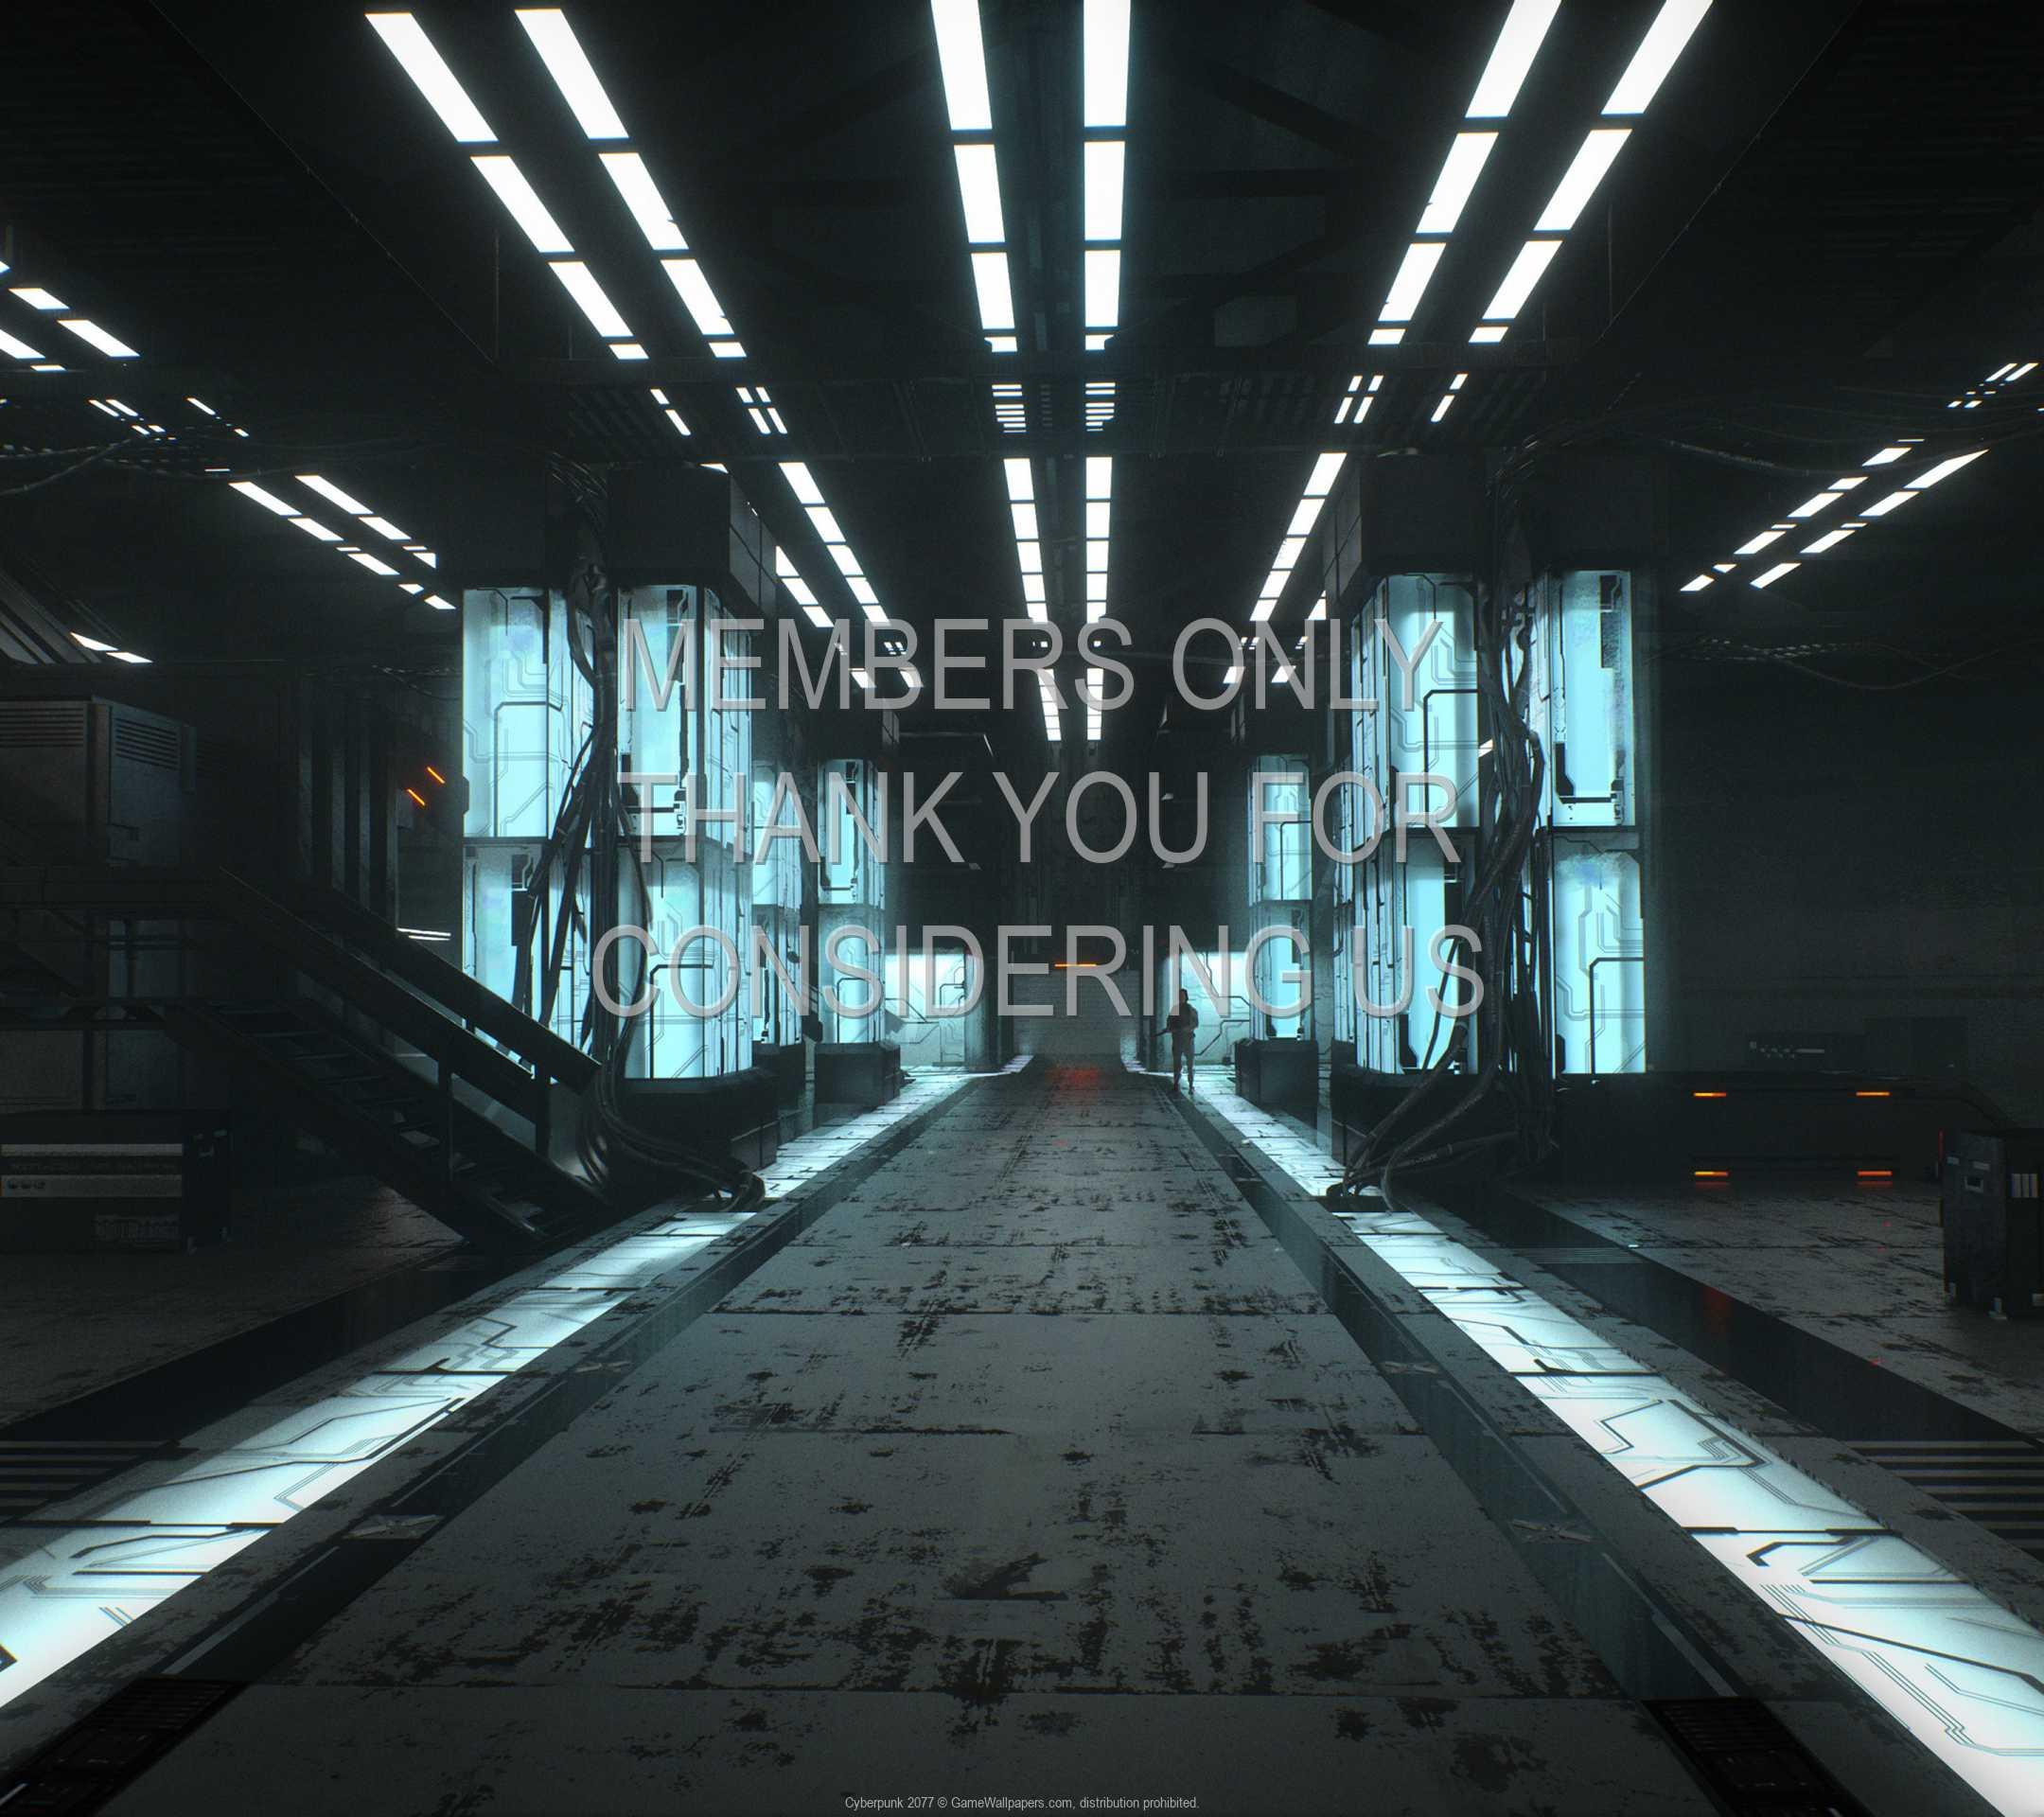 Cyberpunk 2077 1080p Horizontal Móvil fondo de escritorio 65